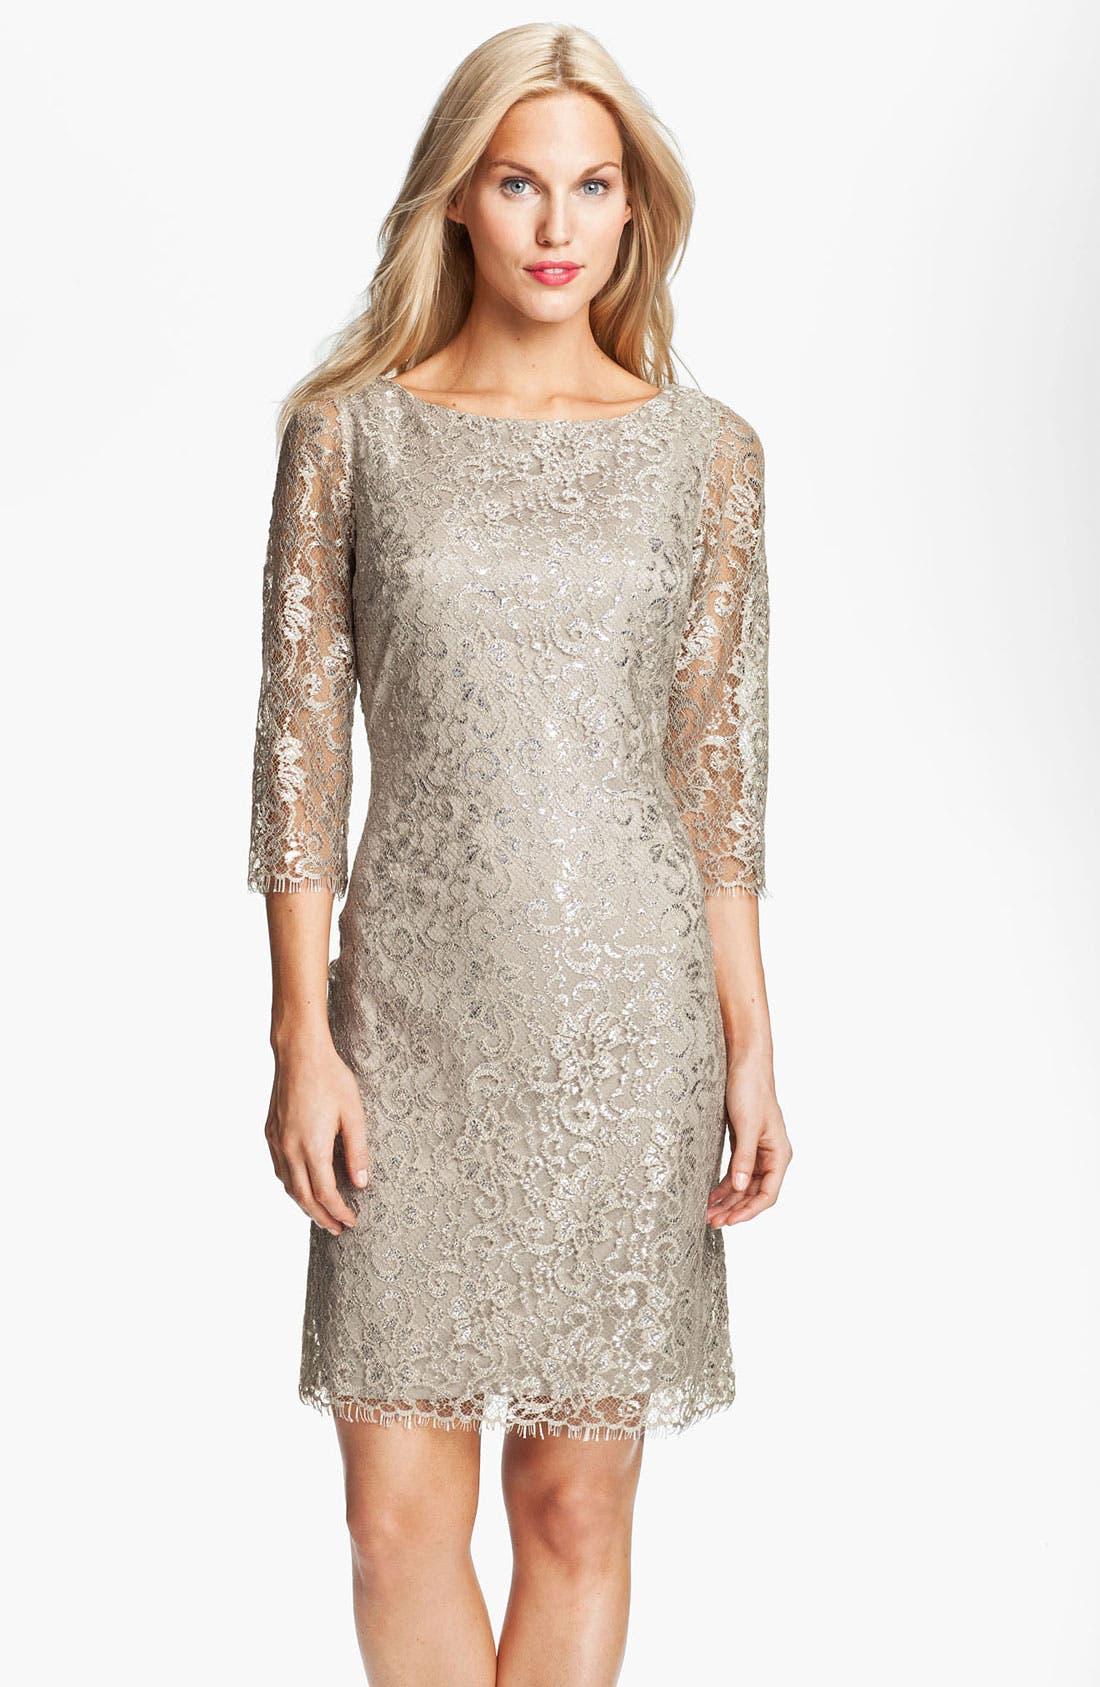 Alternate Image 1 Selected - Calvin Klein Metallic Lace Sheath Dress